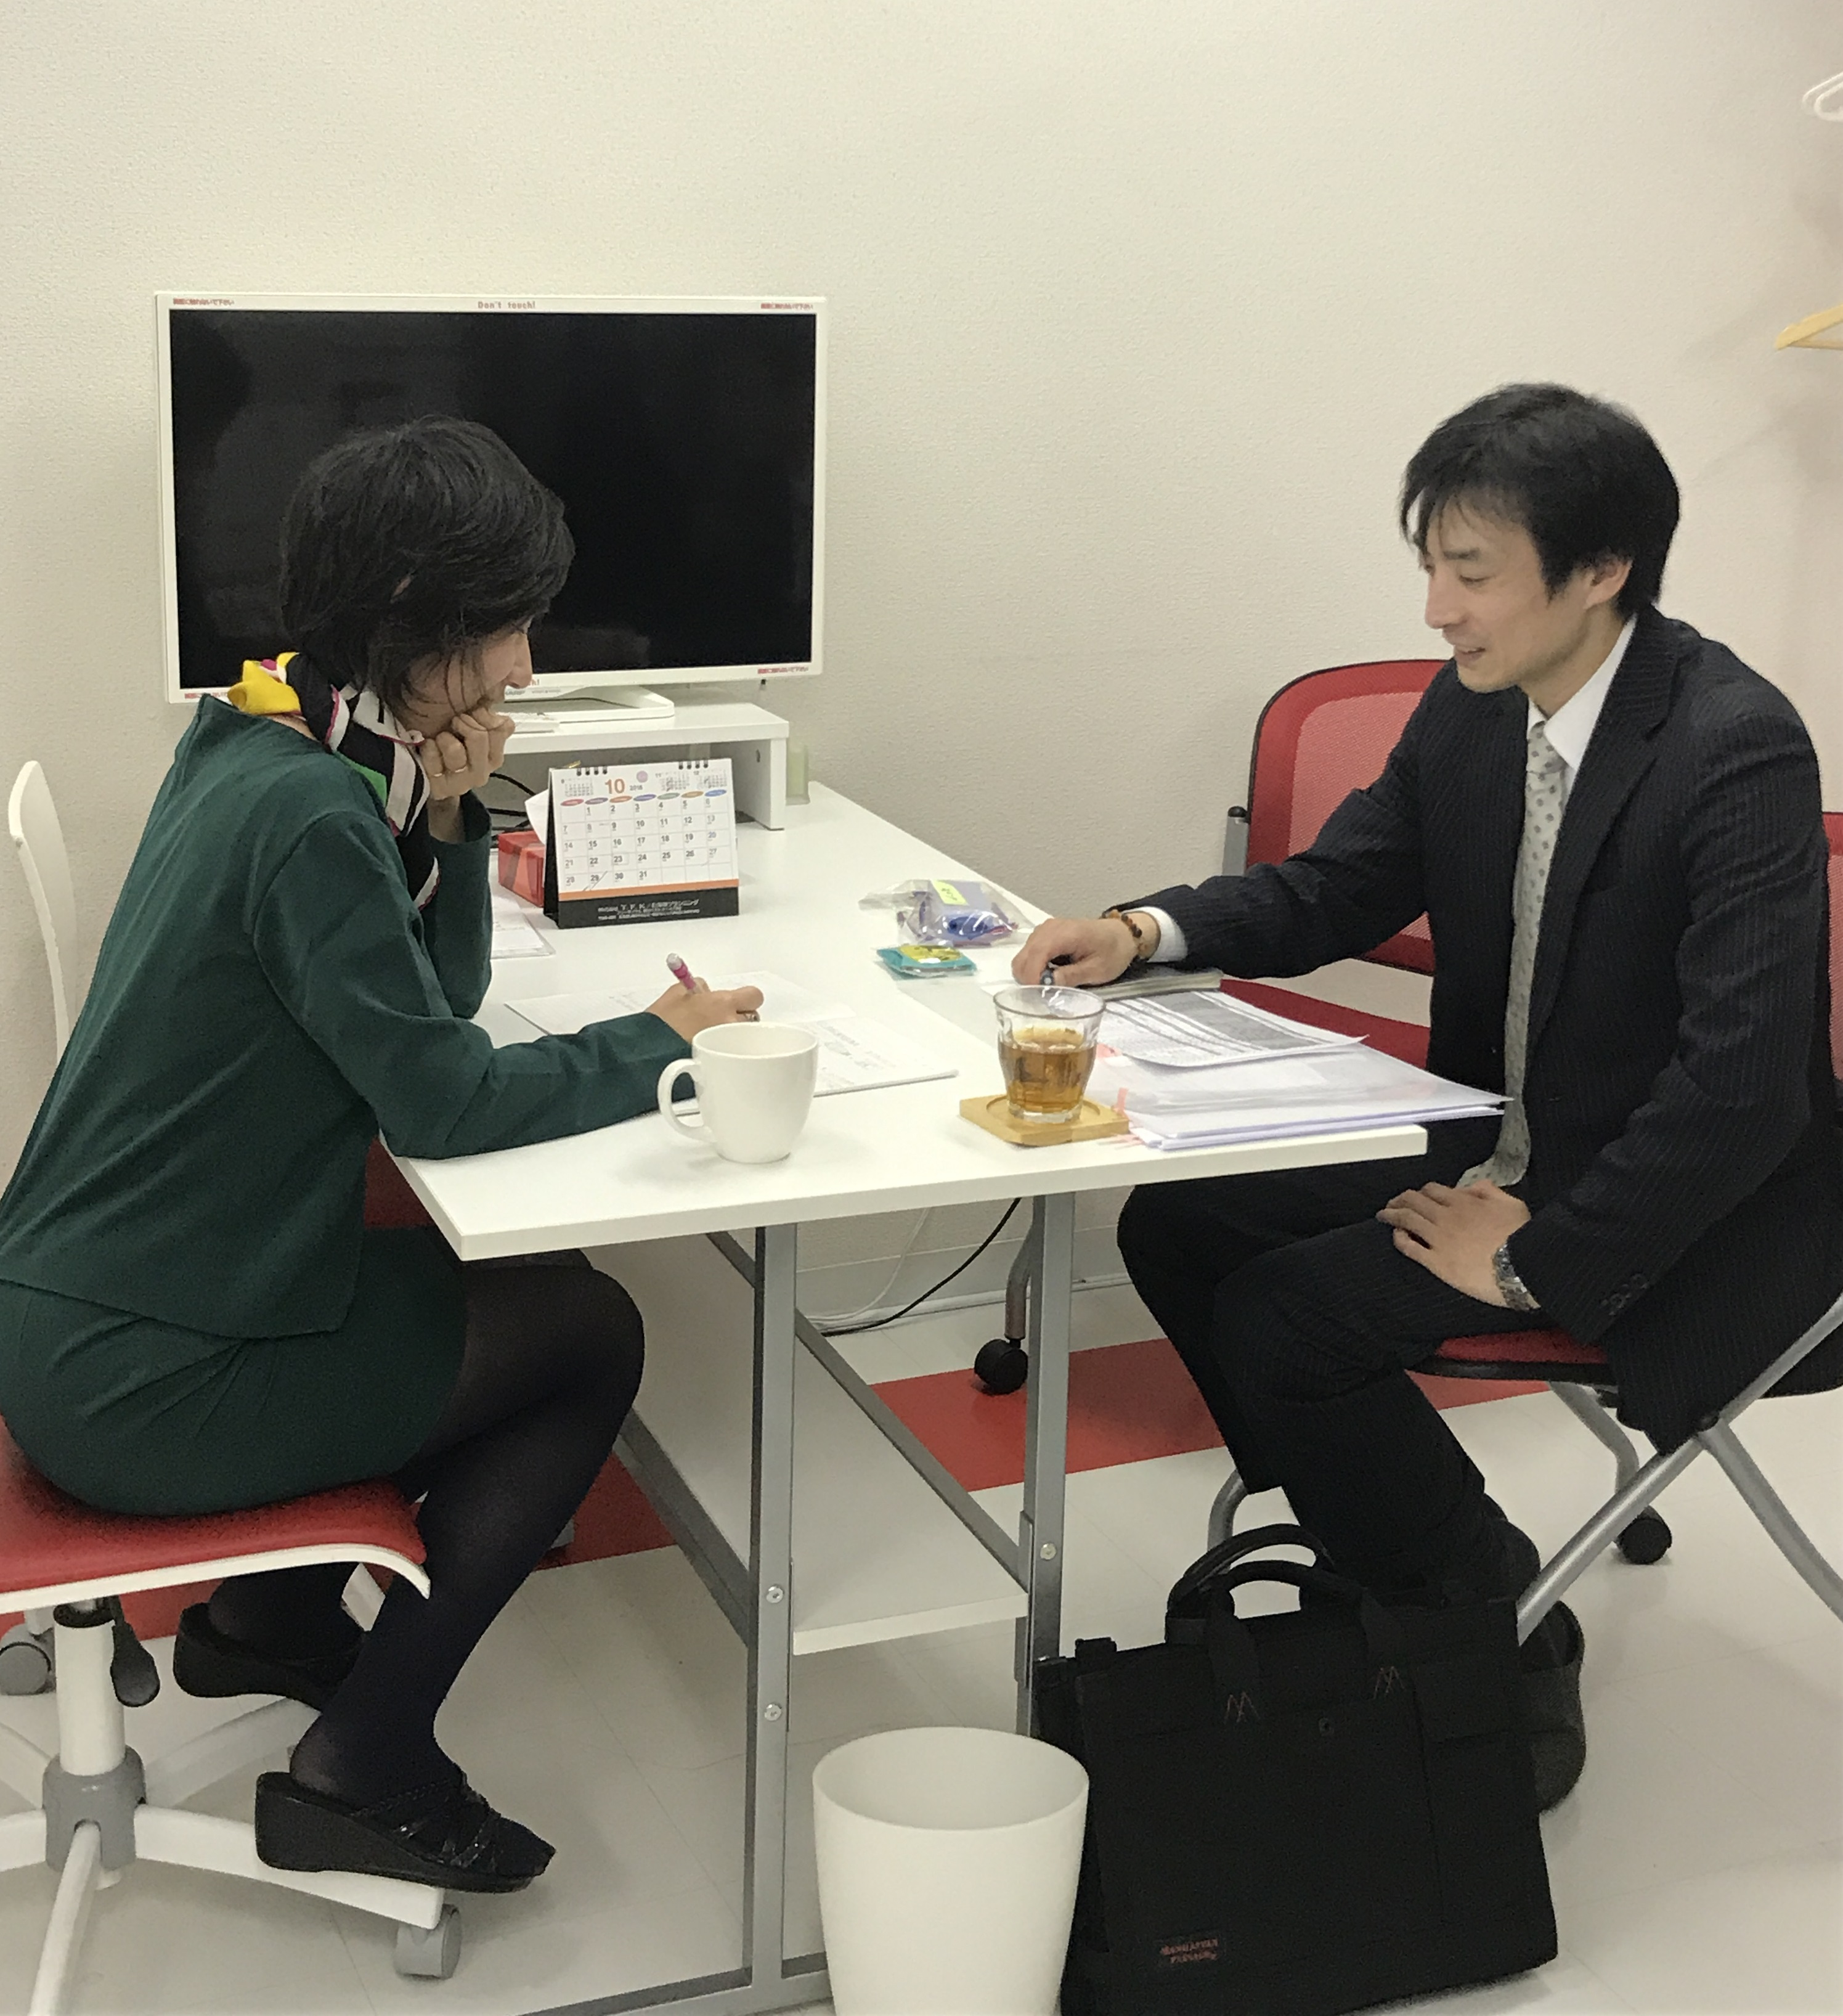 https://www.consultingbox.co.jp/blog/images/IMG_9312.JPG